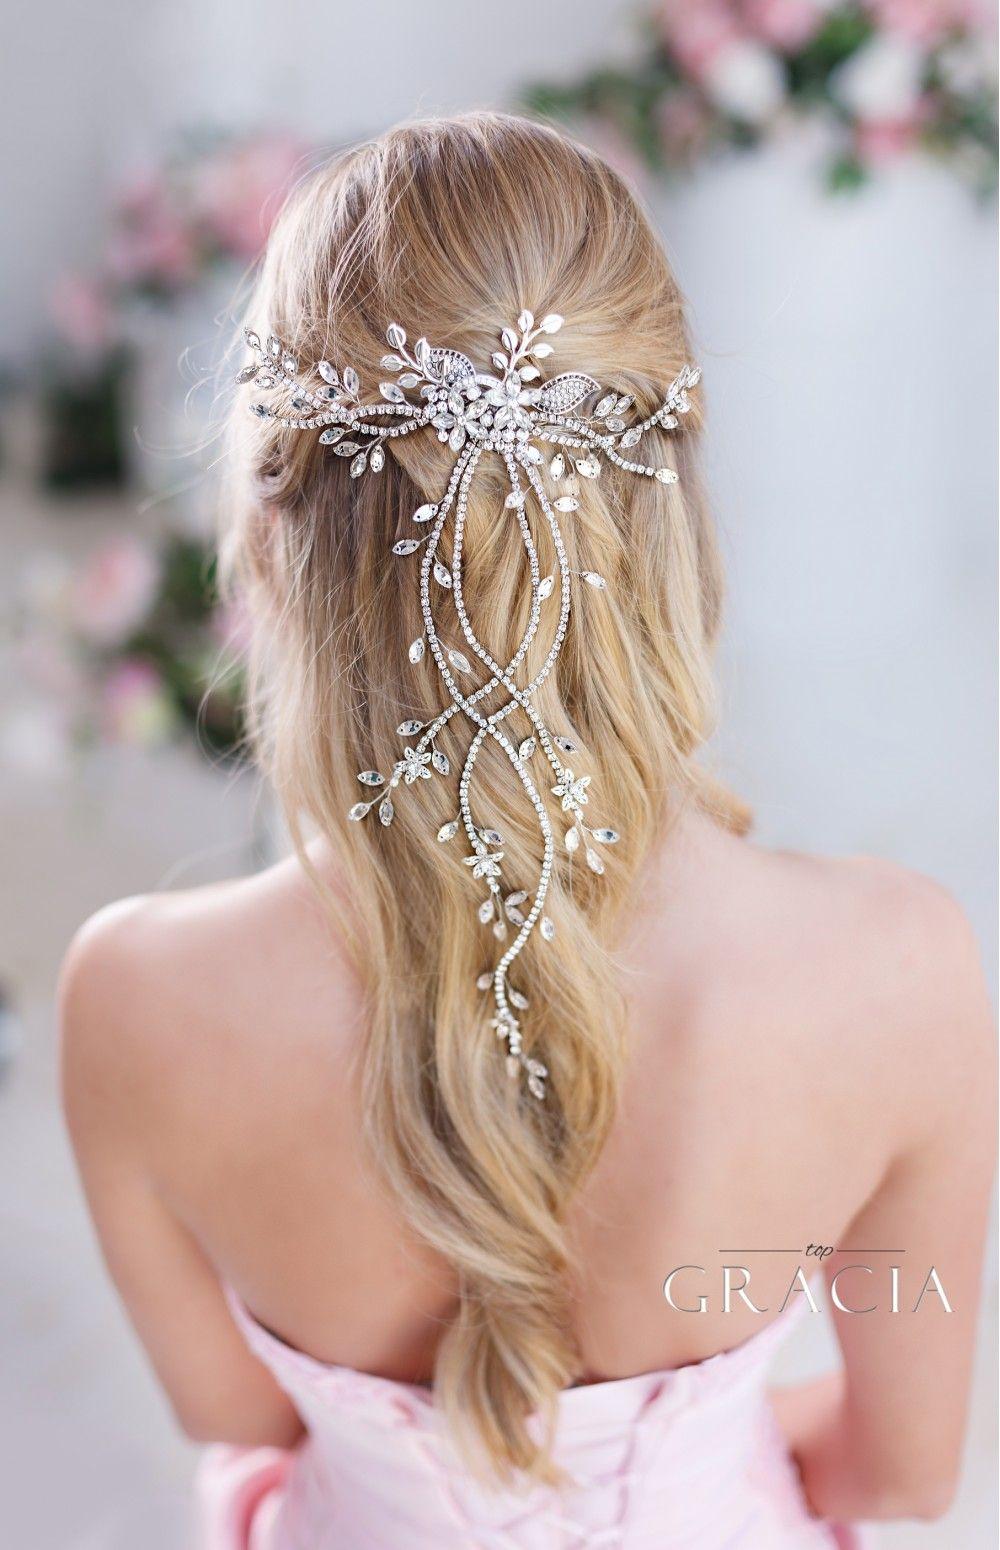 dianthe crystal wedding hair vine with leaf bridal hair comb